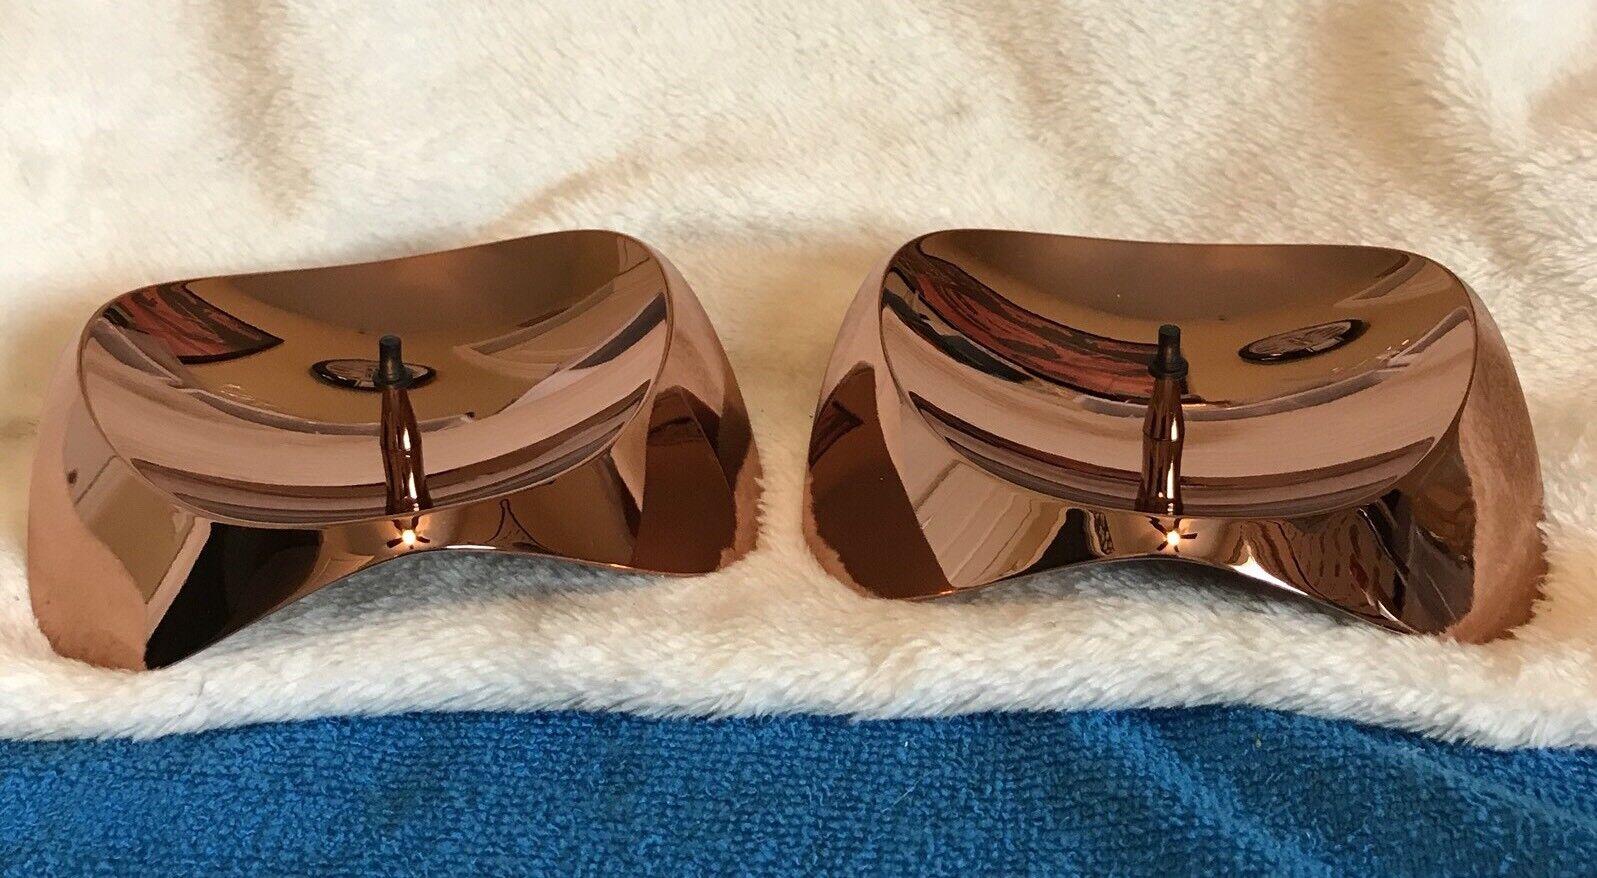 Set of 2 Stelton Papilio Uno Pillar Candle Holders Copper NEWKlaus Rath Design